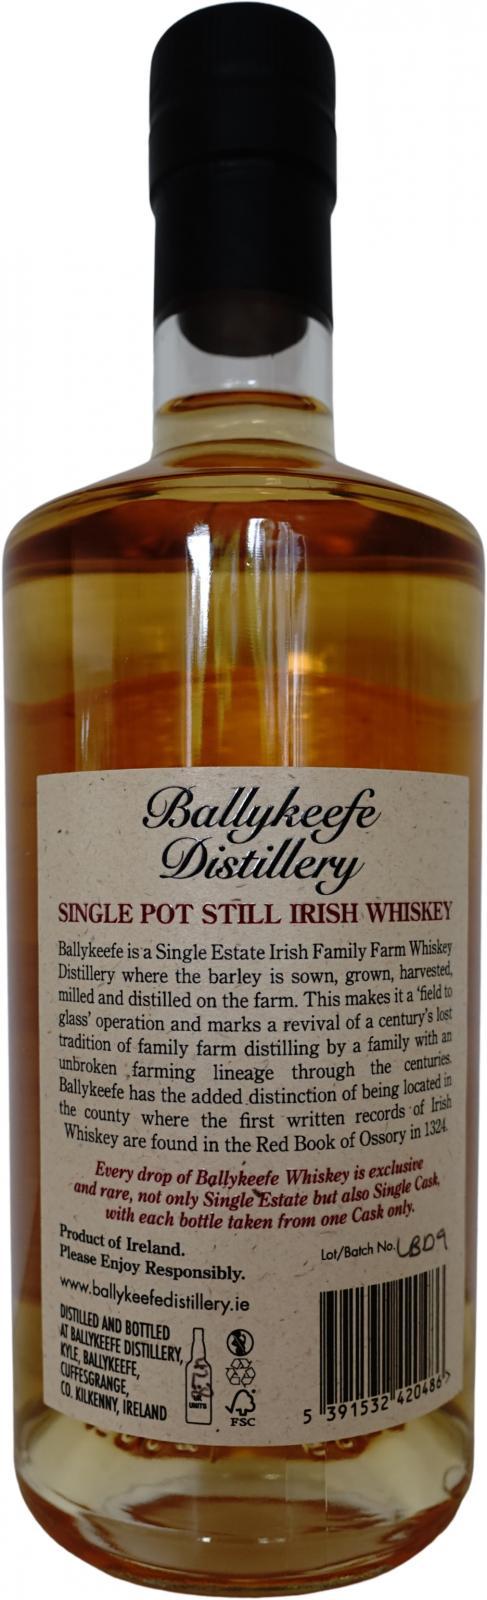 Ballykeefe Distillery 2017